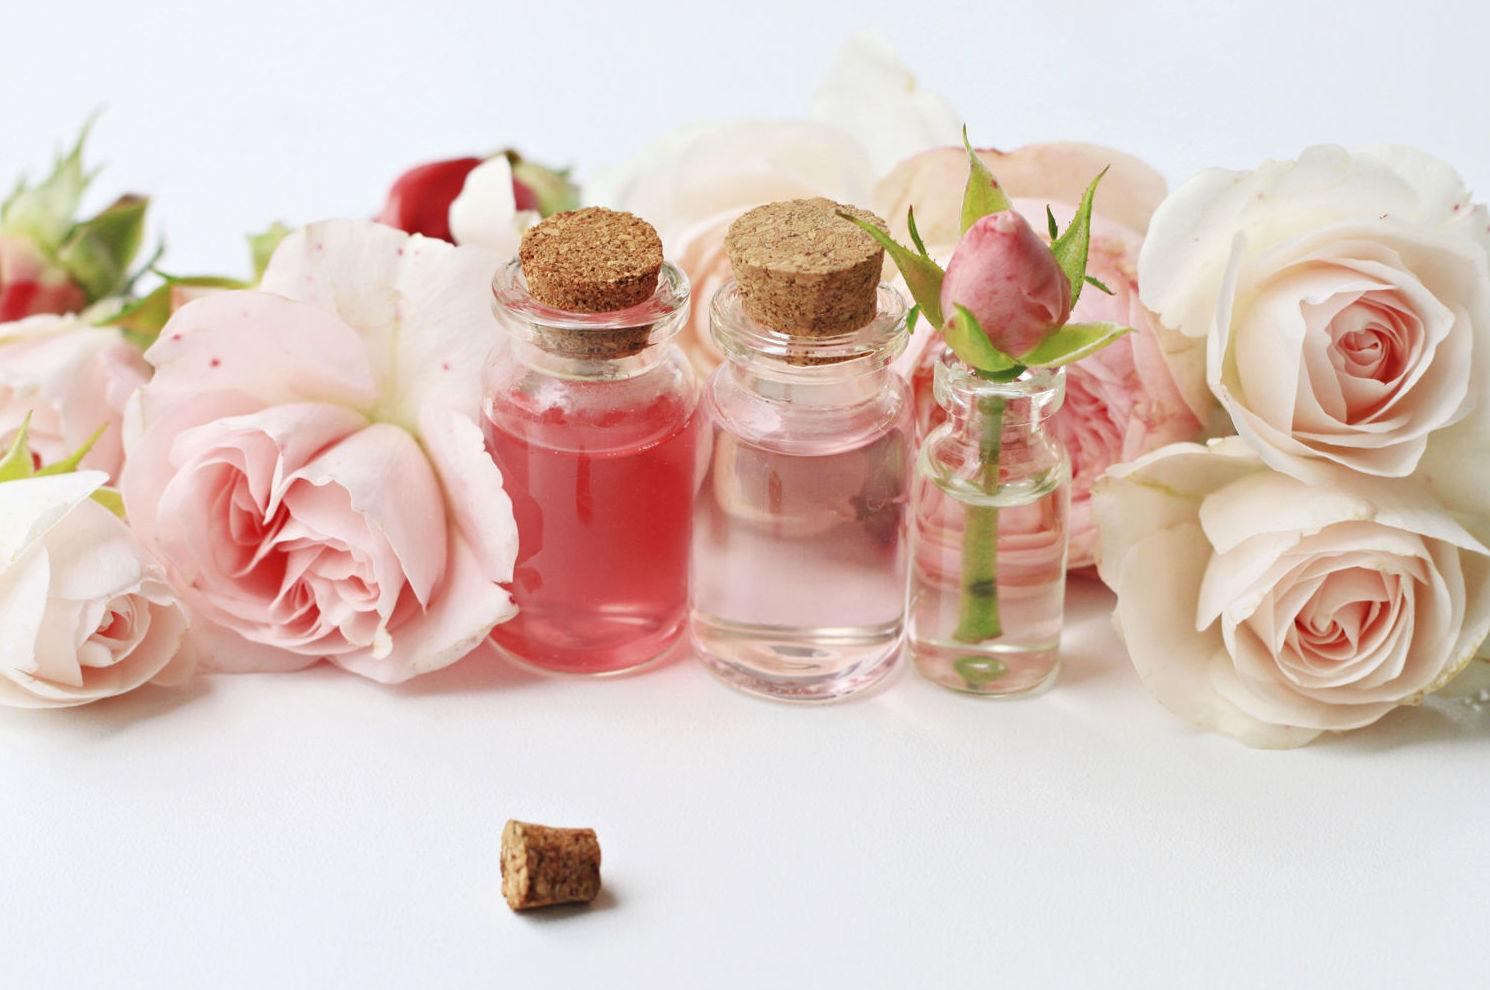 Productos de cosmética natural en Carabanchel